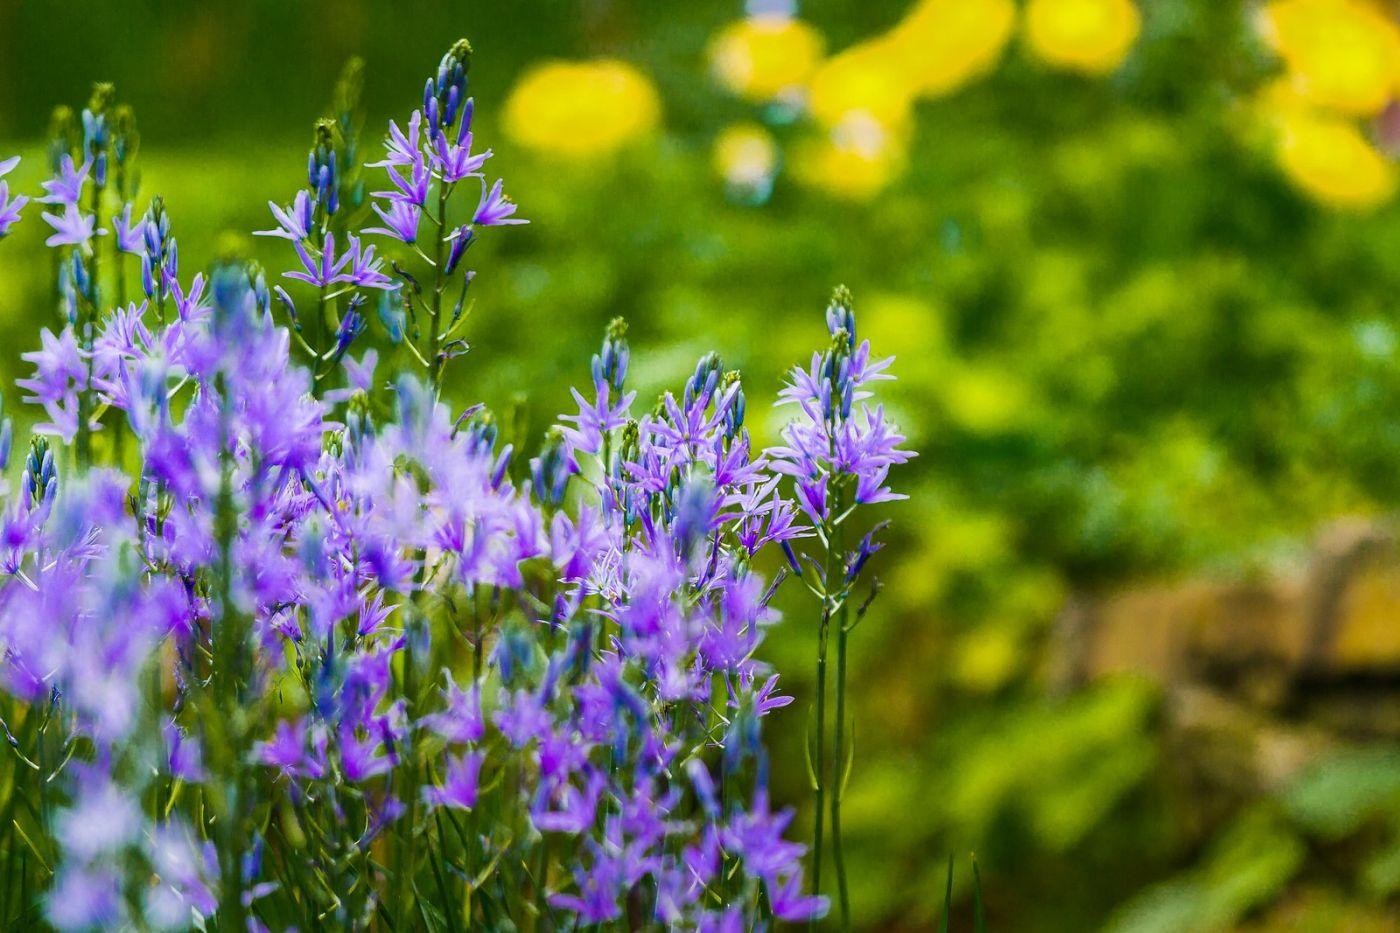 Chanticleer花园,有梦想的季节_图1-8